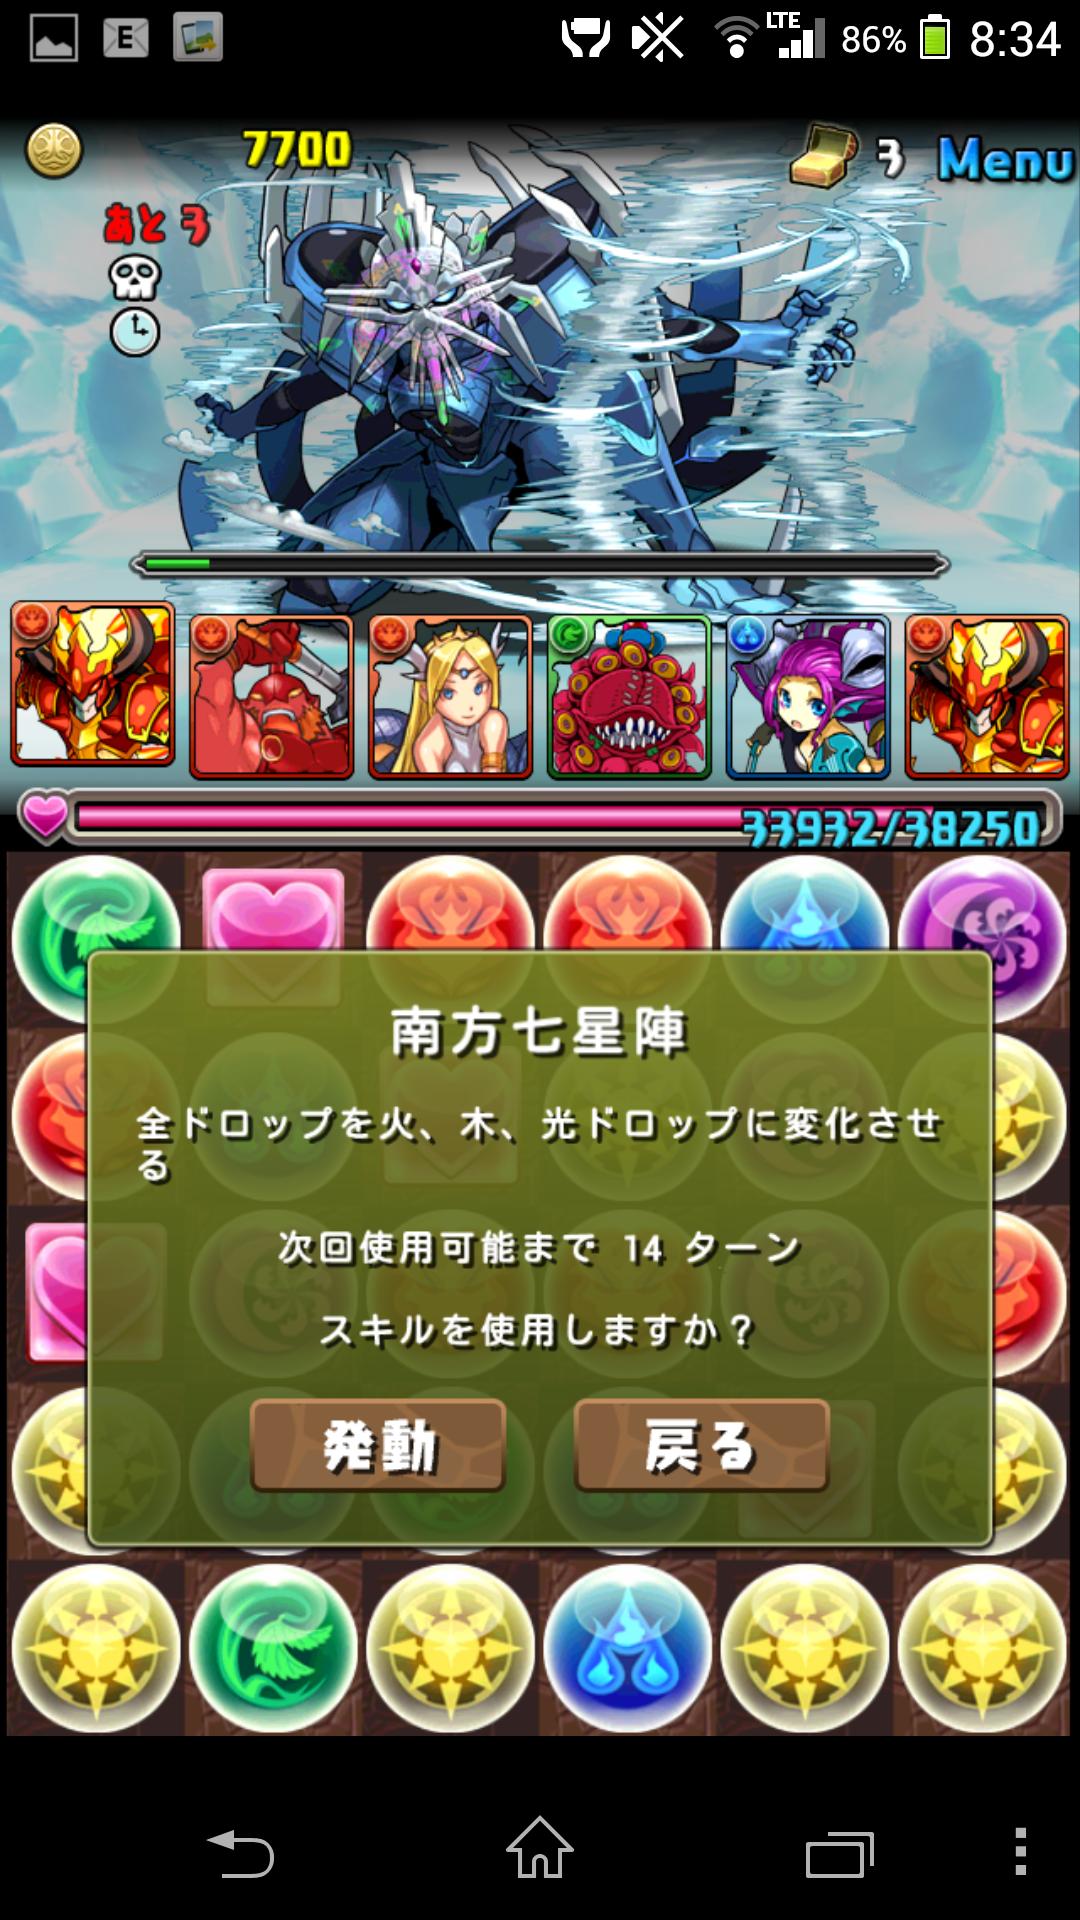 Screenshot_2014-04-04-08-34-56.png